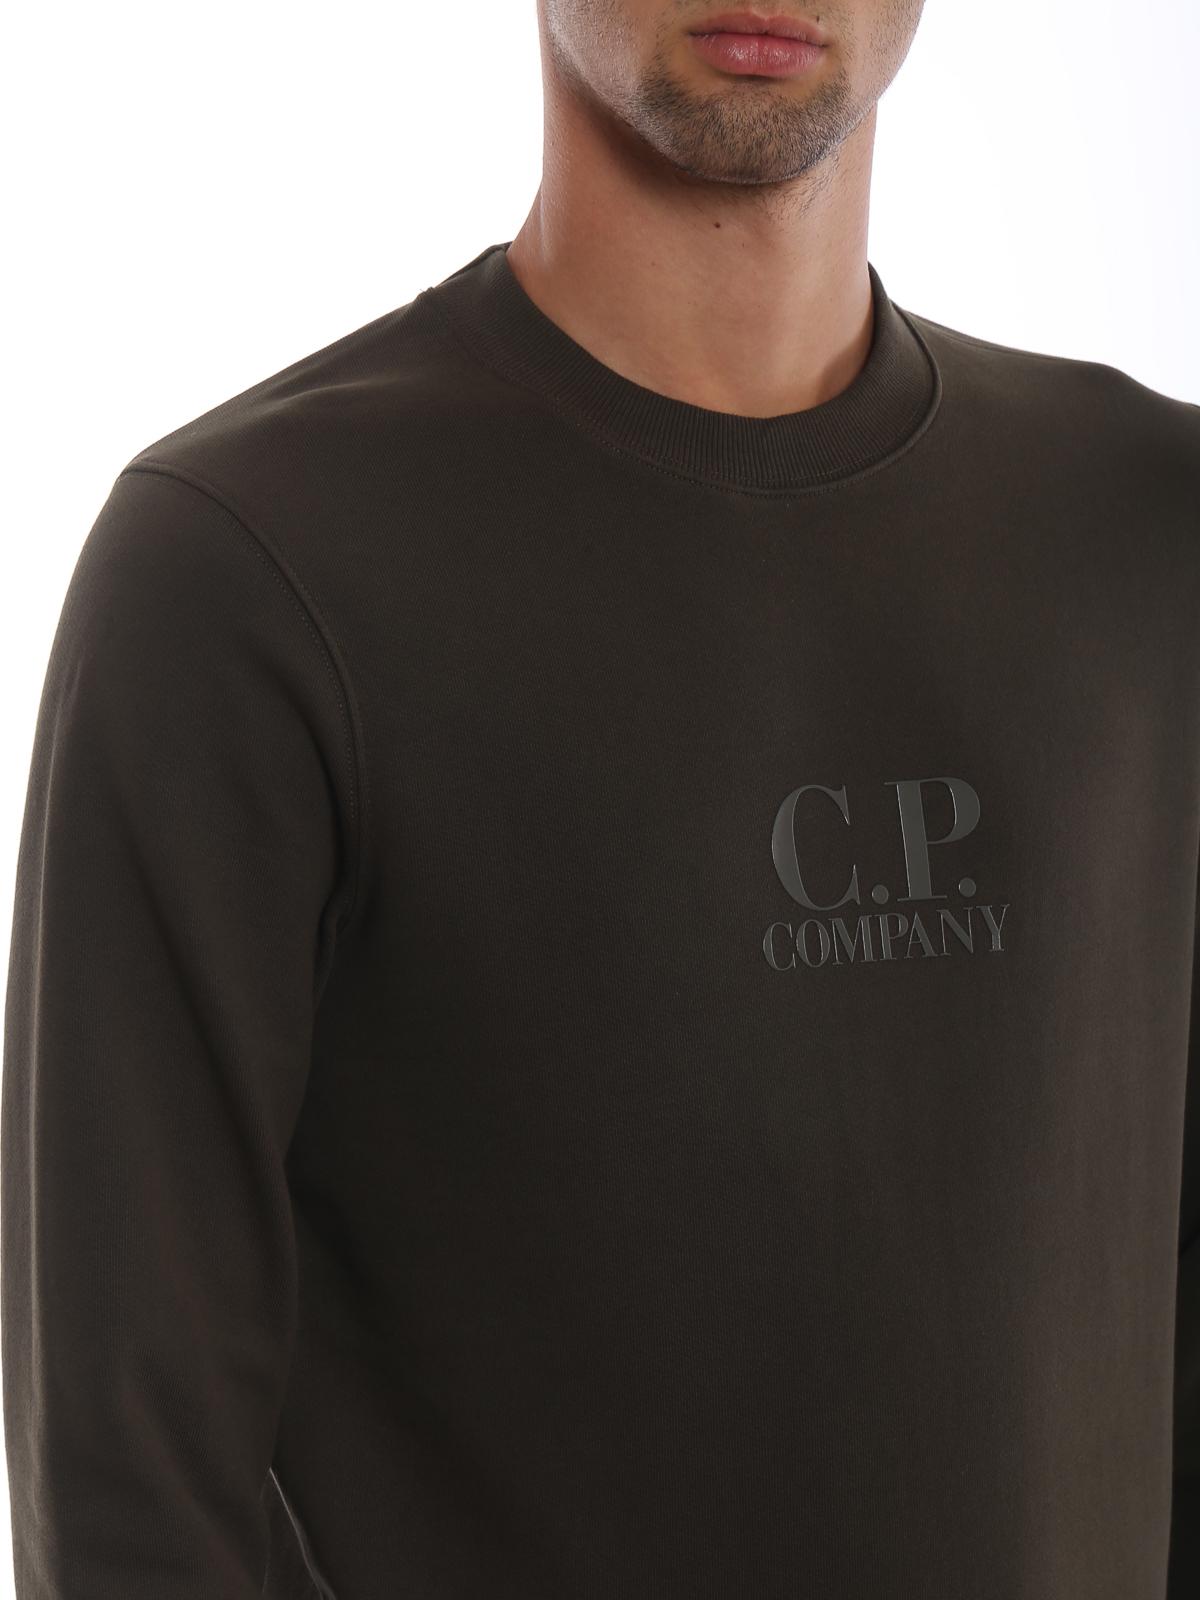 CP COMPANY buy online Army green diagonal fleece logo sweatshirt 1cd980d8ced9